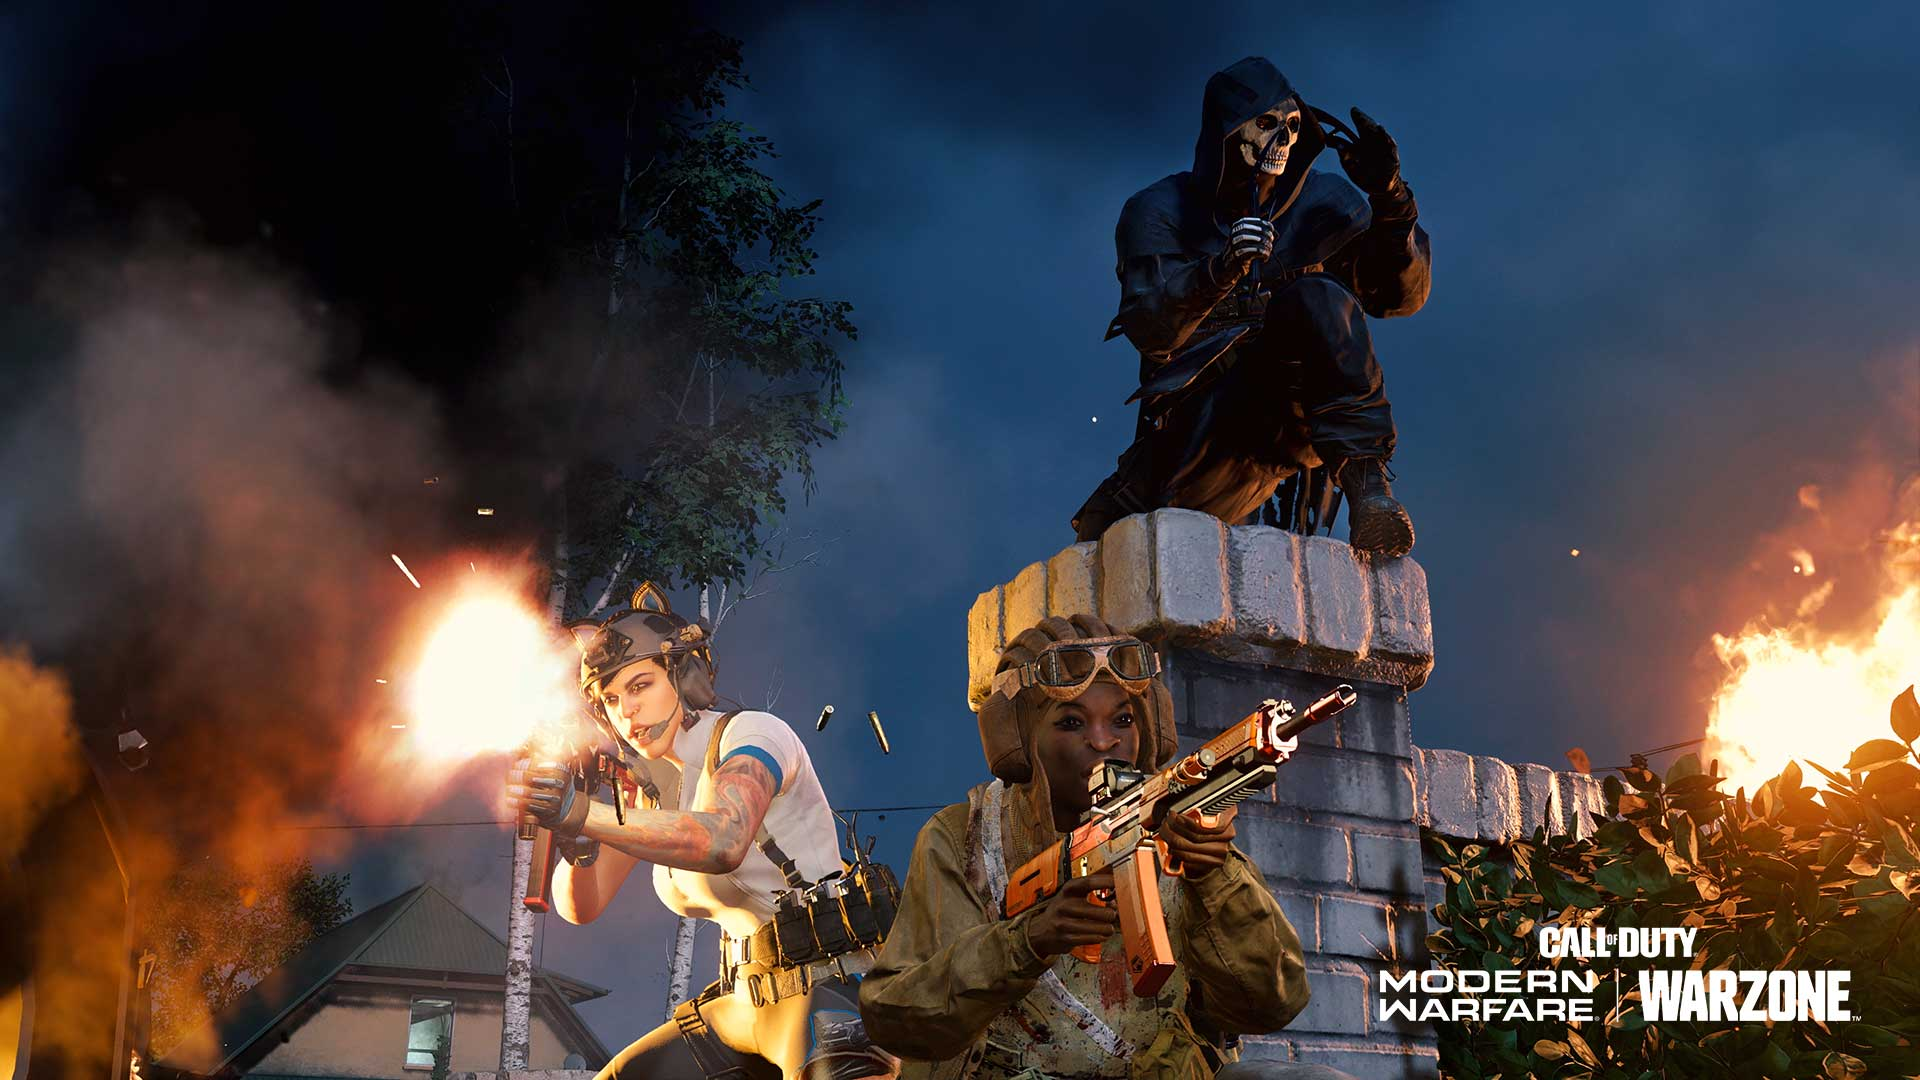 Warzone night mode